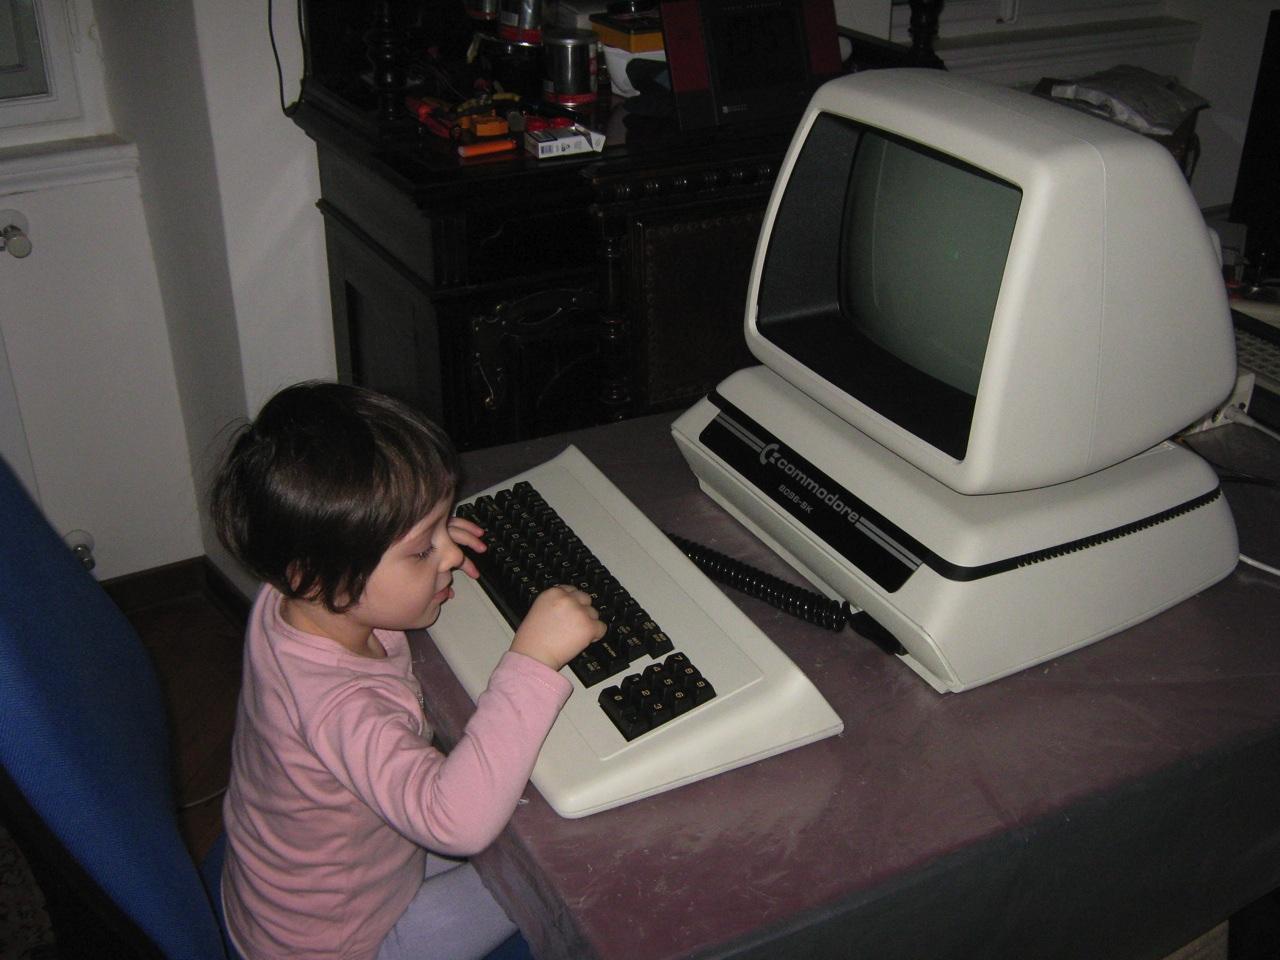 8096 | nIGHTFALL Blog / RetroComputerMania.com